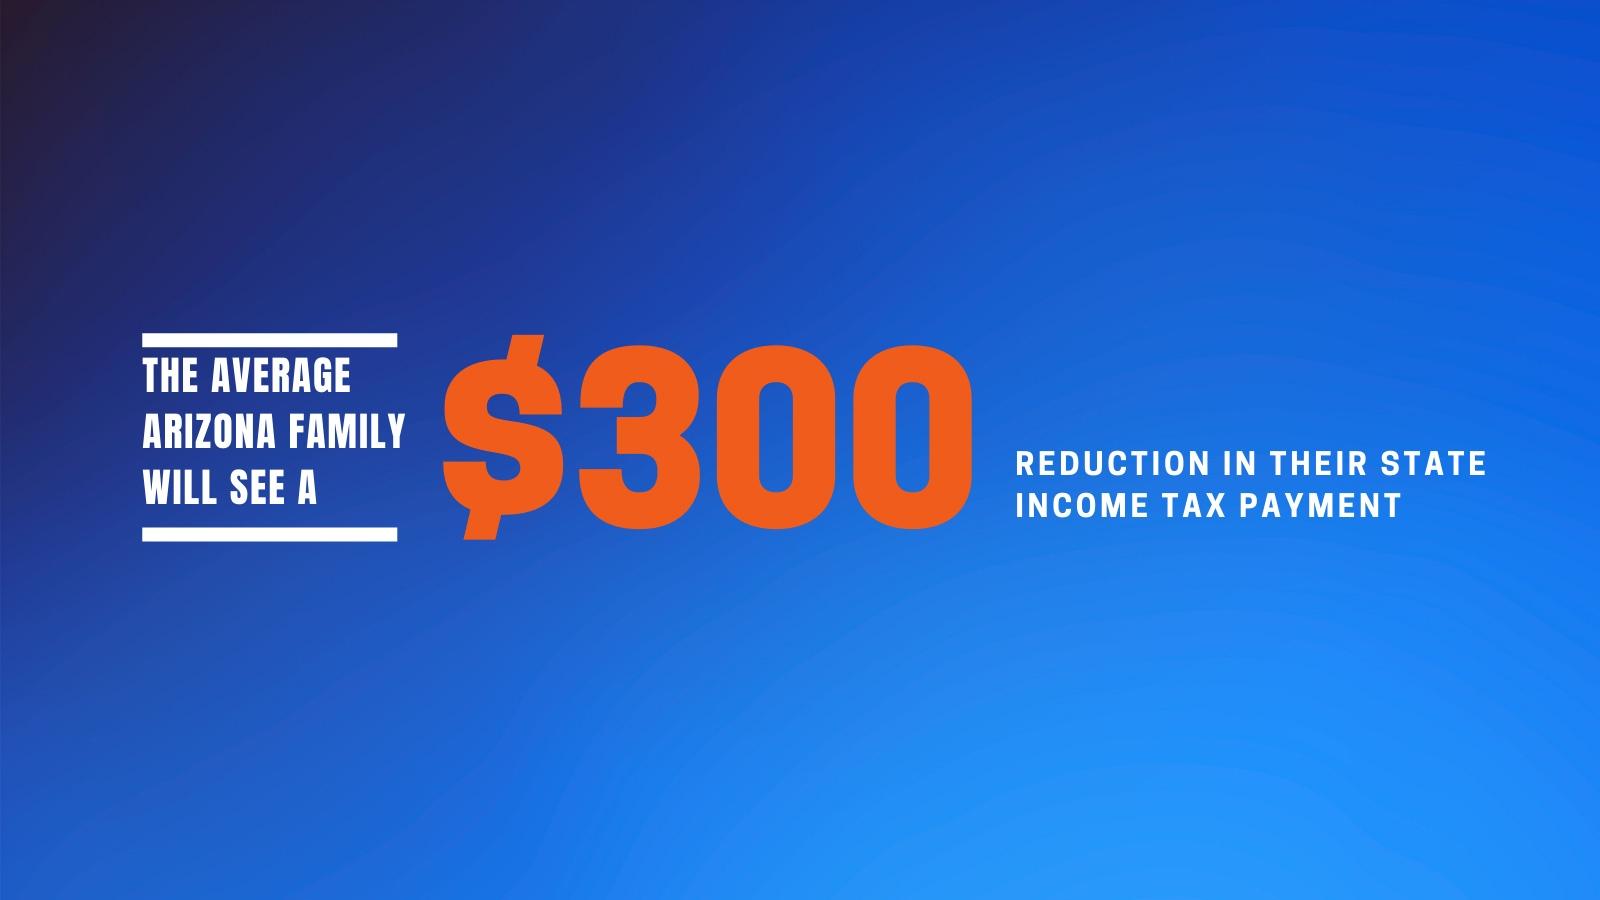 $300 tax reduction for the average Arizonan